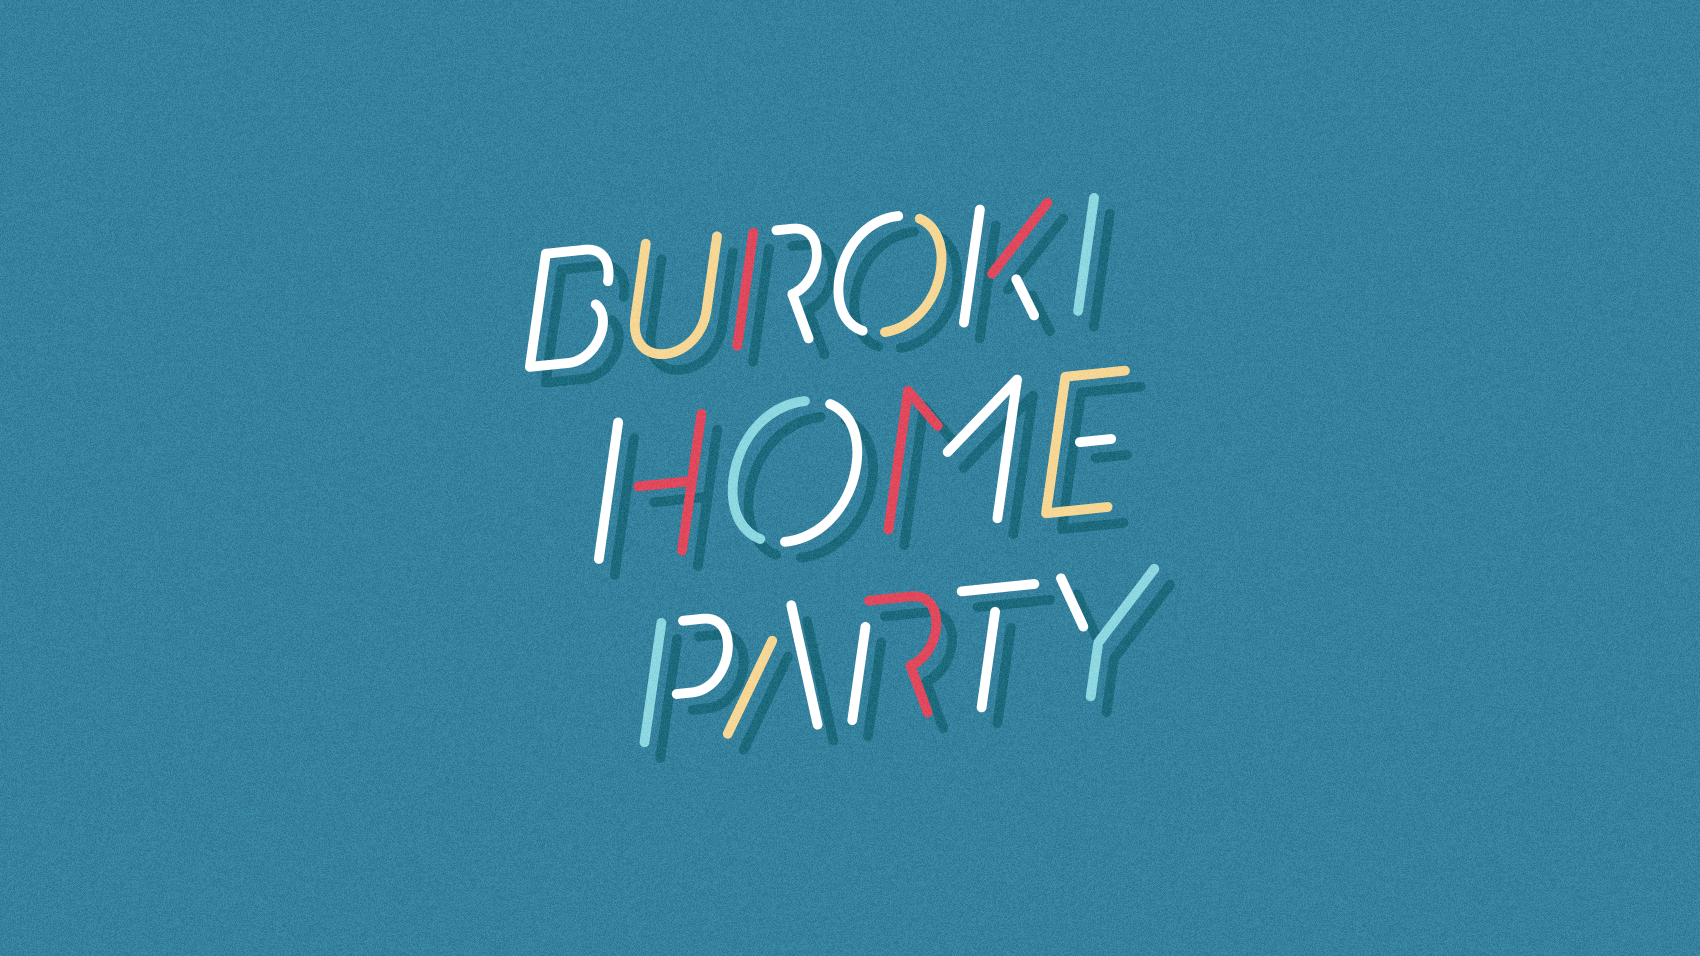 BUROKI HOME PARTYタイポグラフィ